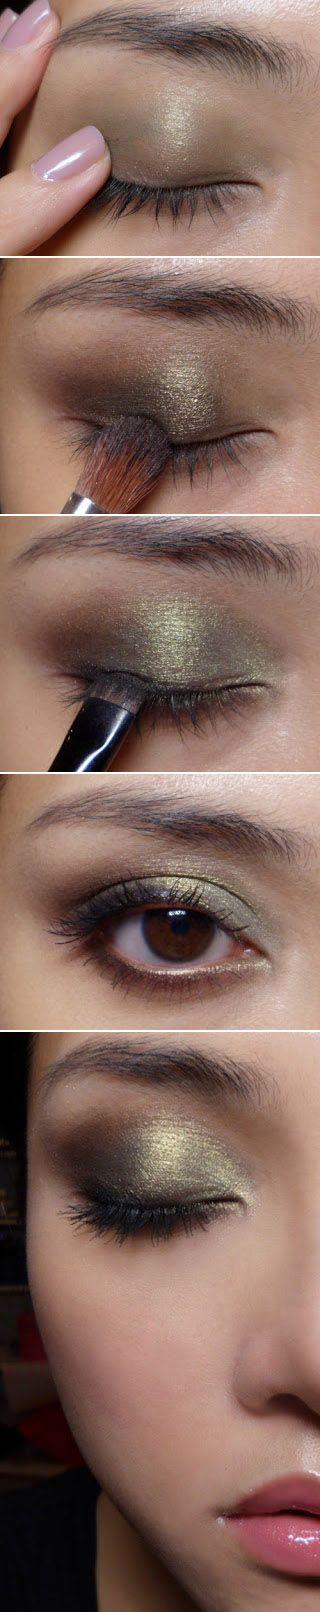 Dark Golden Olive Eyeshadow Tutorial | 22 Beauty Tutorials For Dramatic Holiday Looks